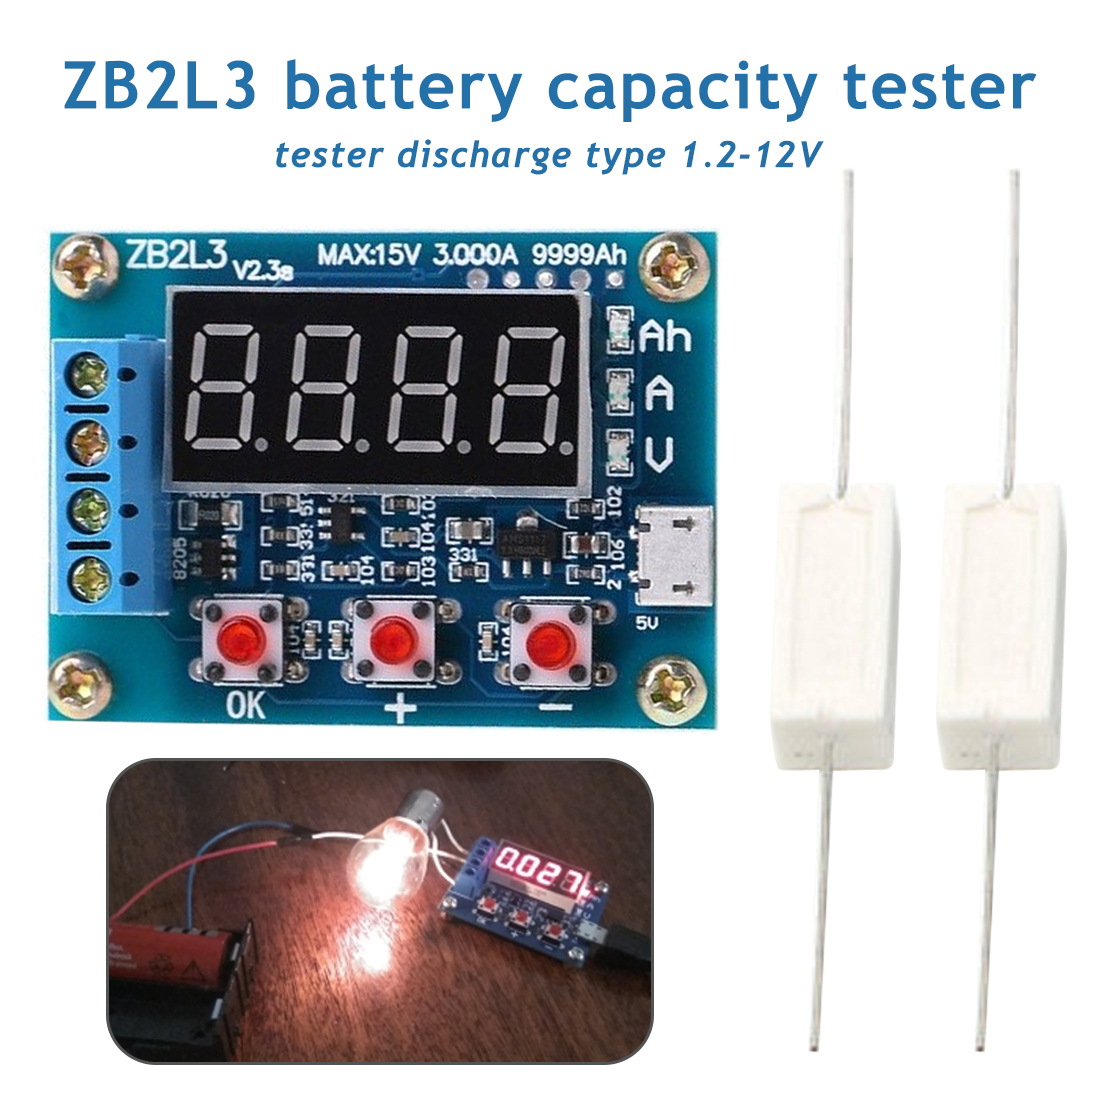 1,2-12 V Zb2l3 Li-ion Lithium-blei-säure Batterie Kapazität Meter Entladung Tester Analyzer Batterie Tester Angenehme SüßE